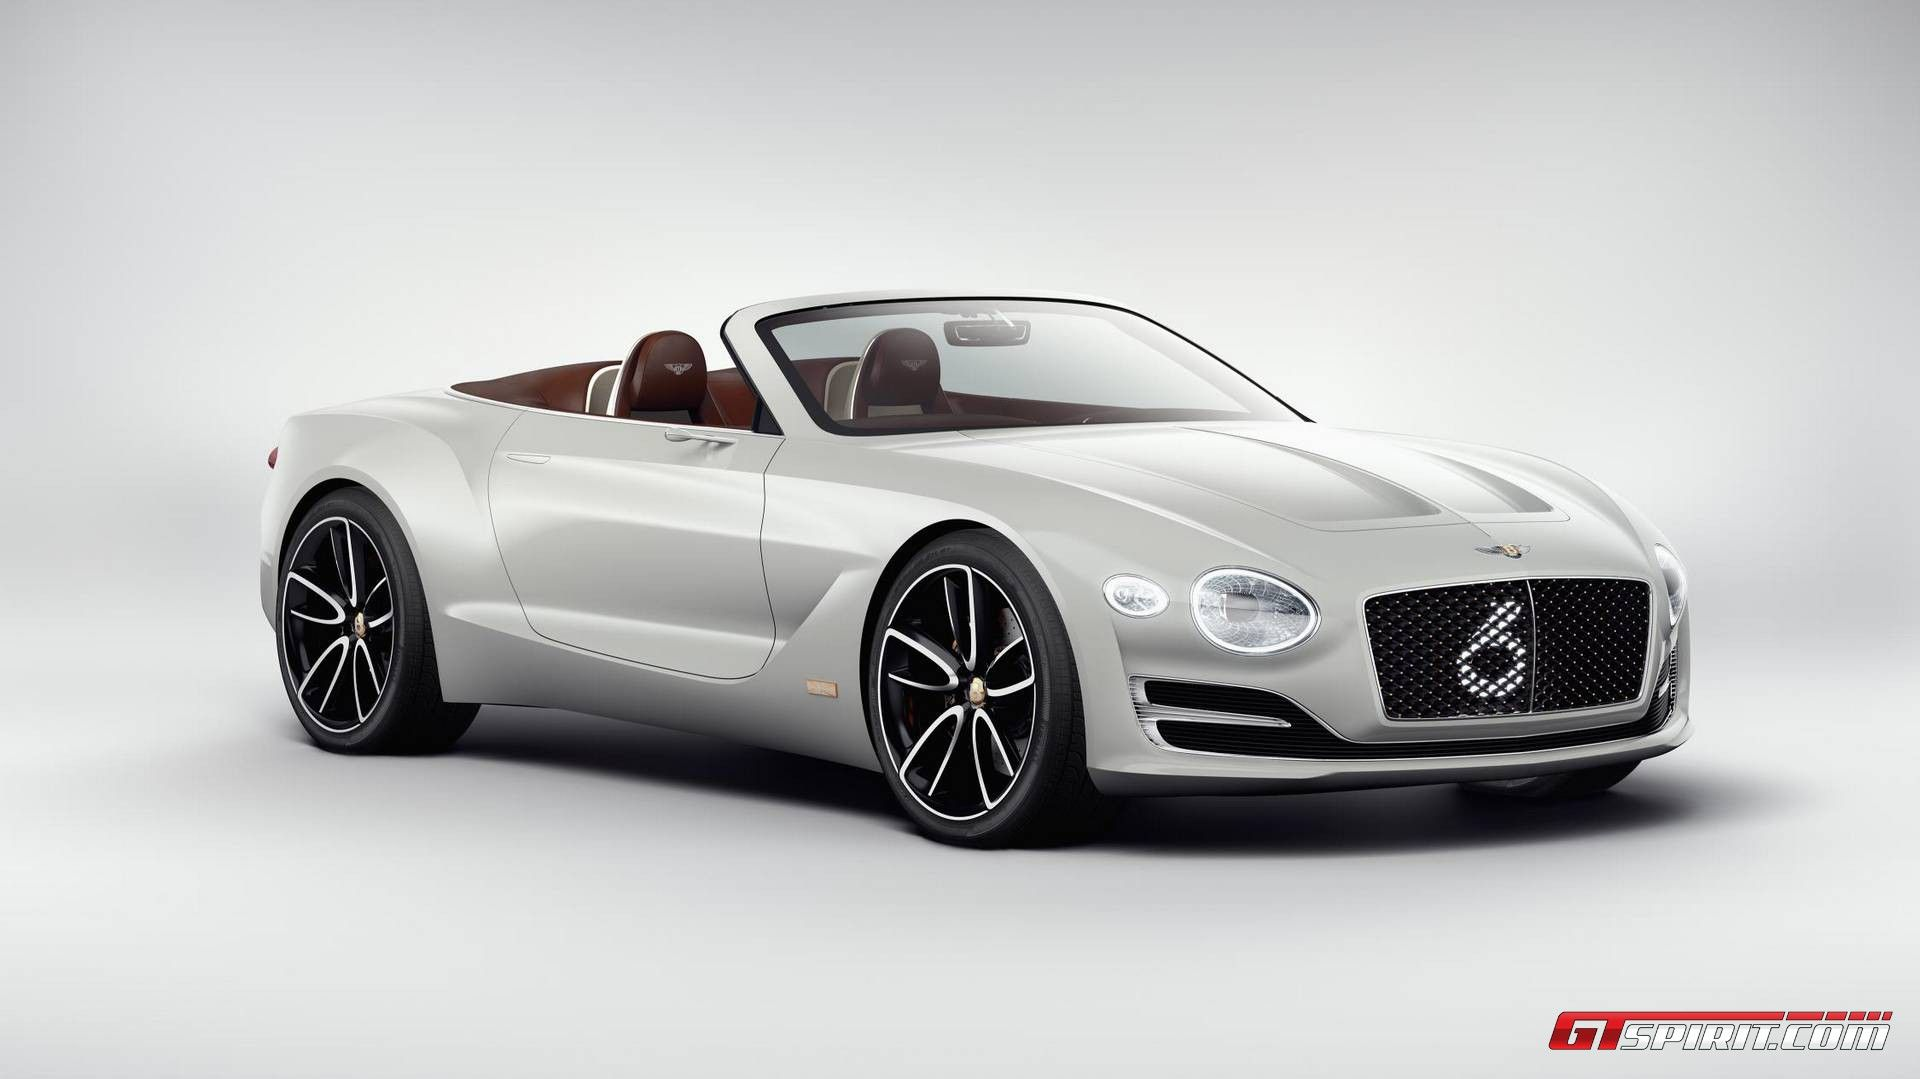 2017 Bentley EXP12 Speed 6e Concept Stevie s Cars